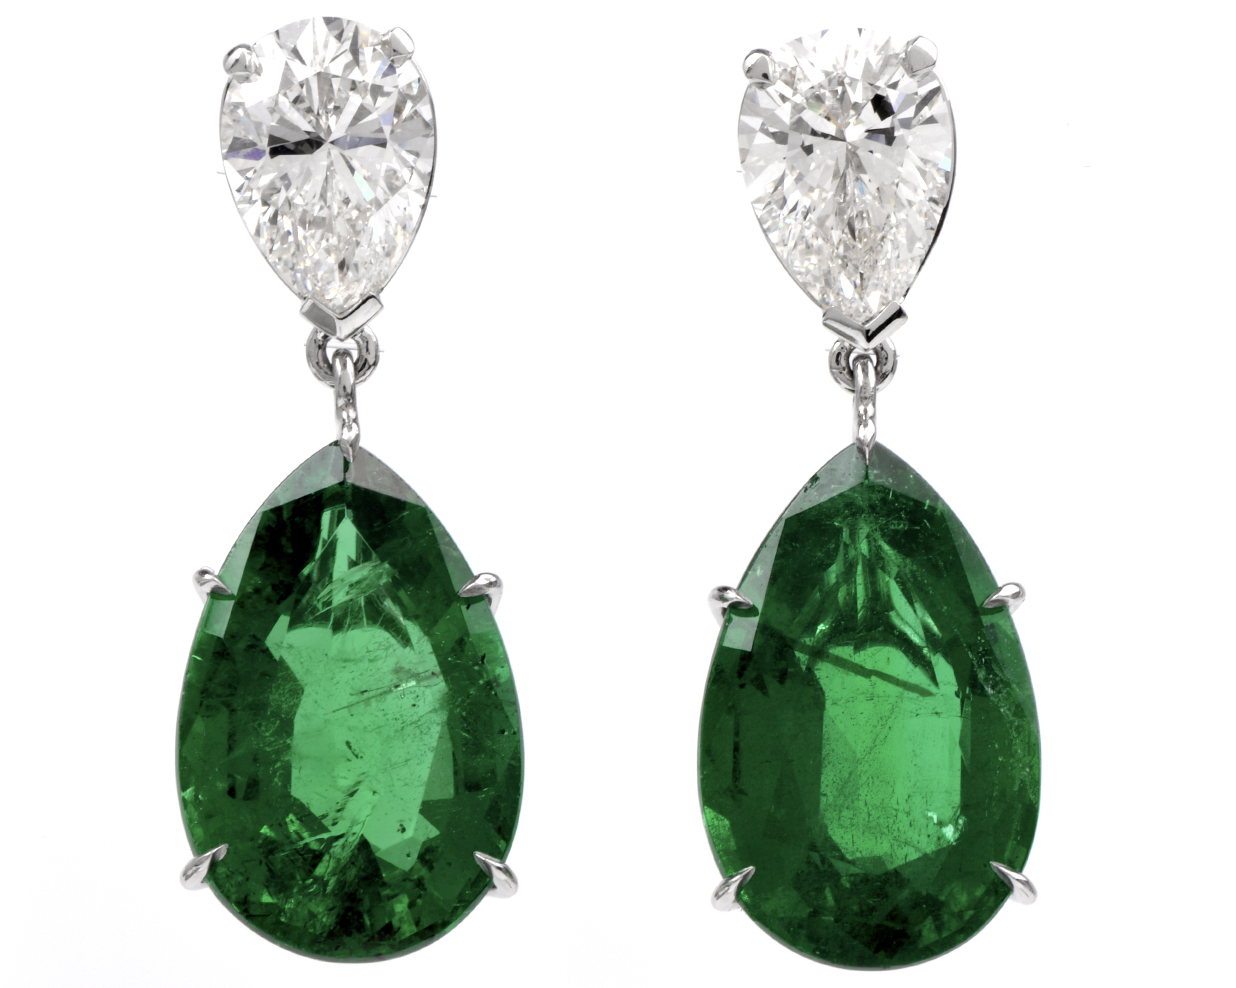 Explore Beautifuldiamonds